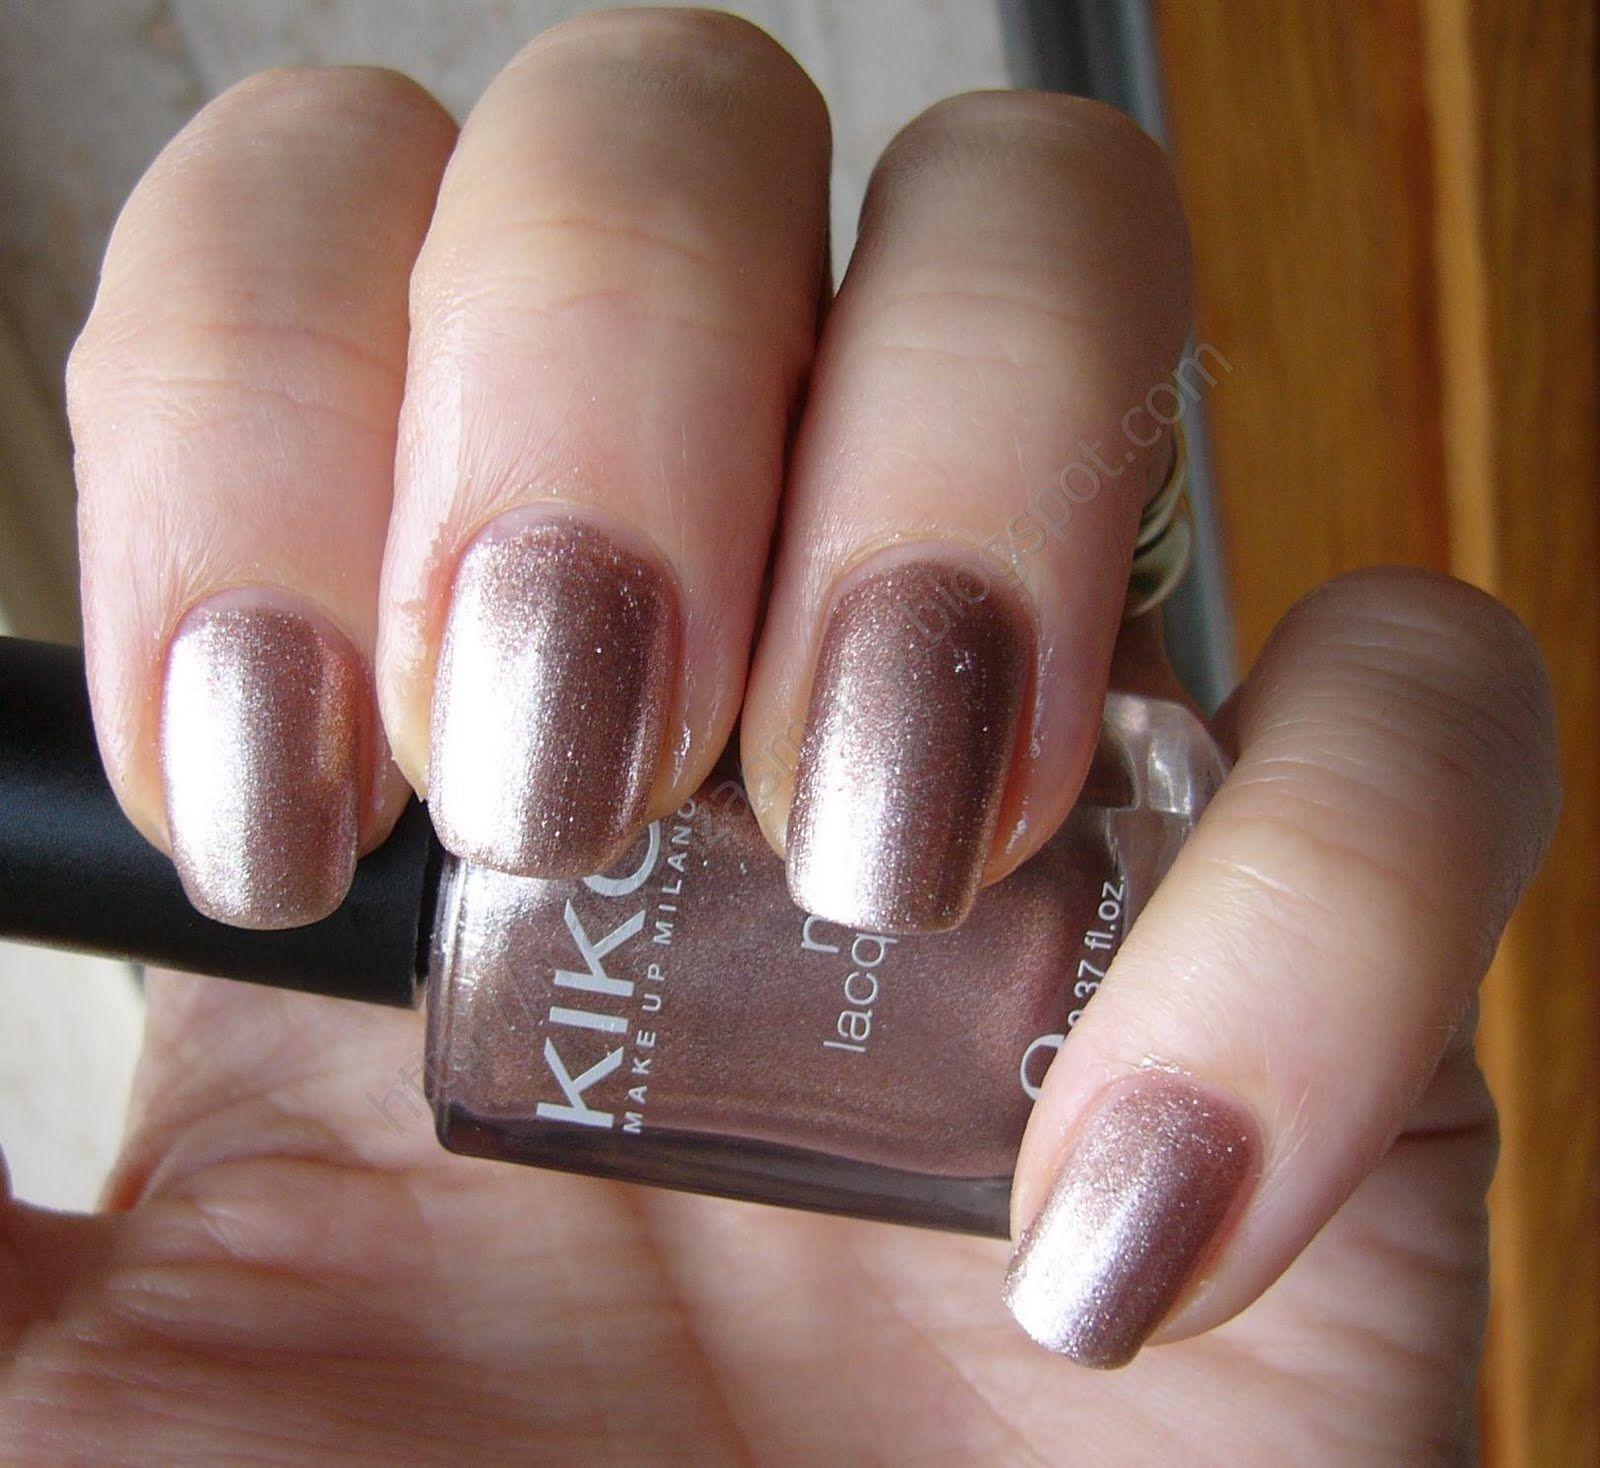 Kiko - nail polish - 303 - beige chrome http://www.kikocosmetics.com ...